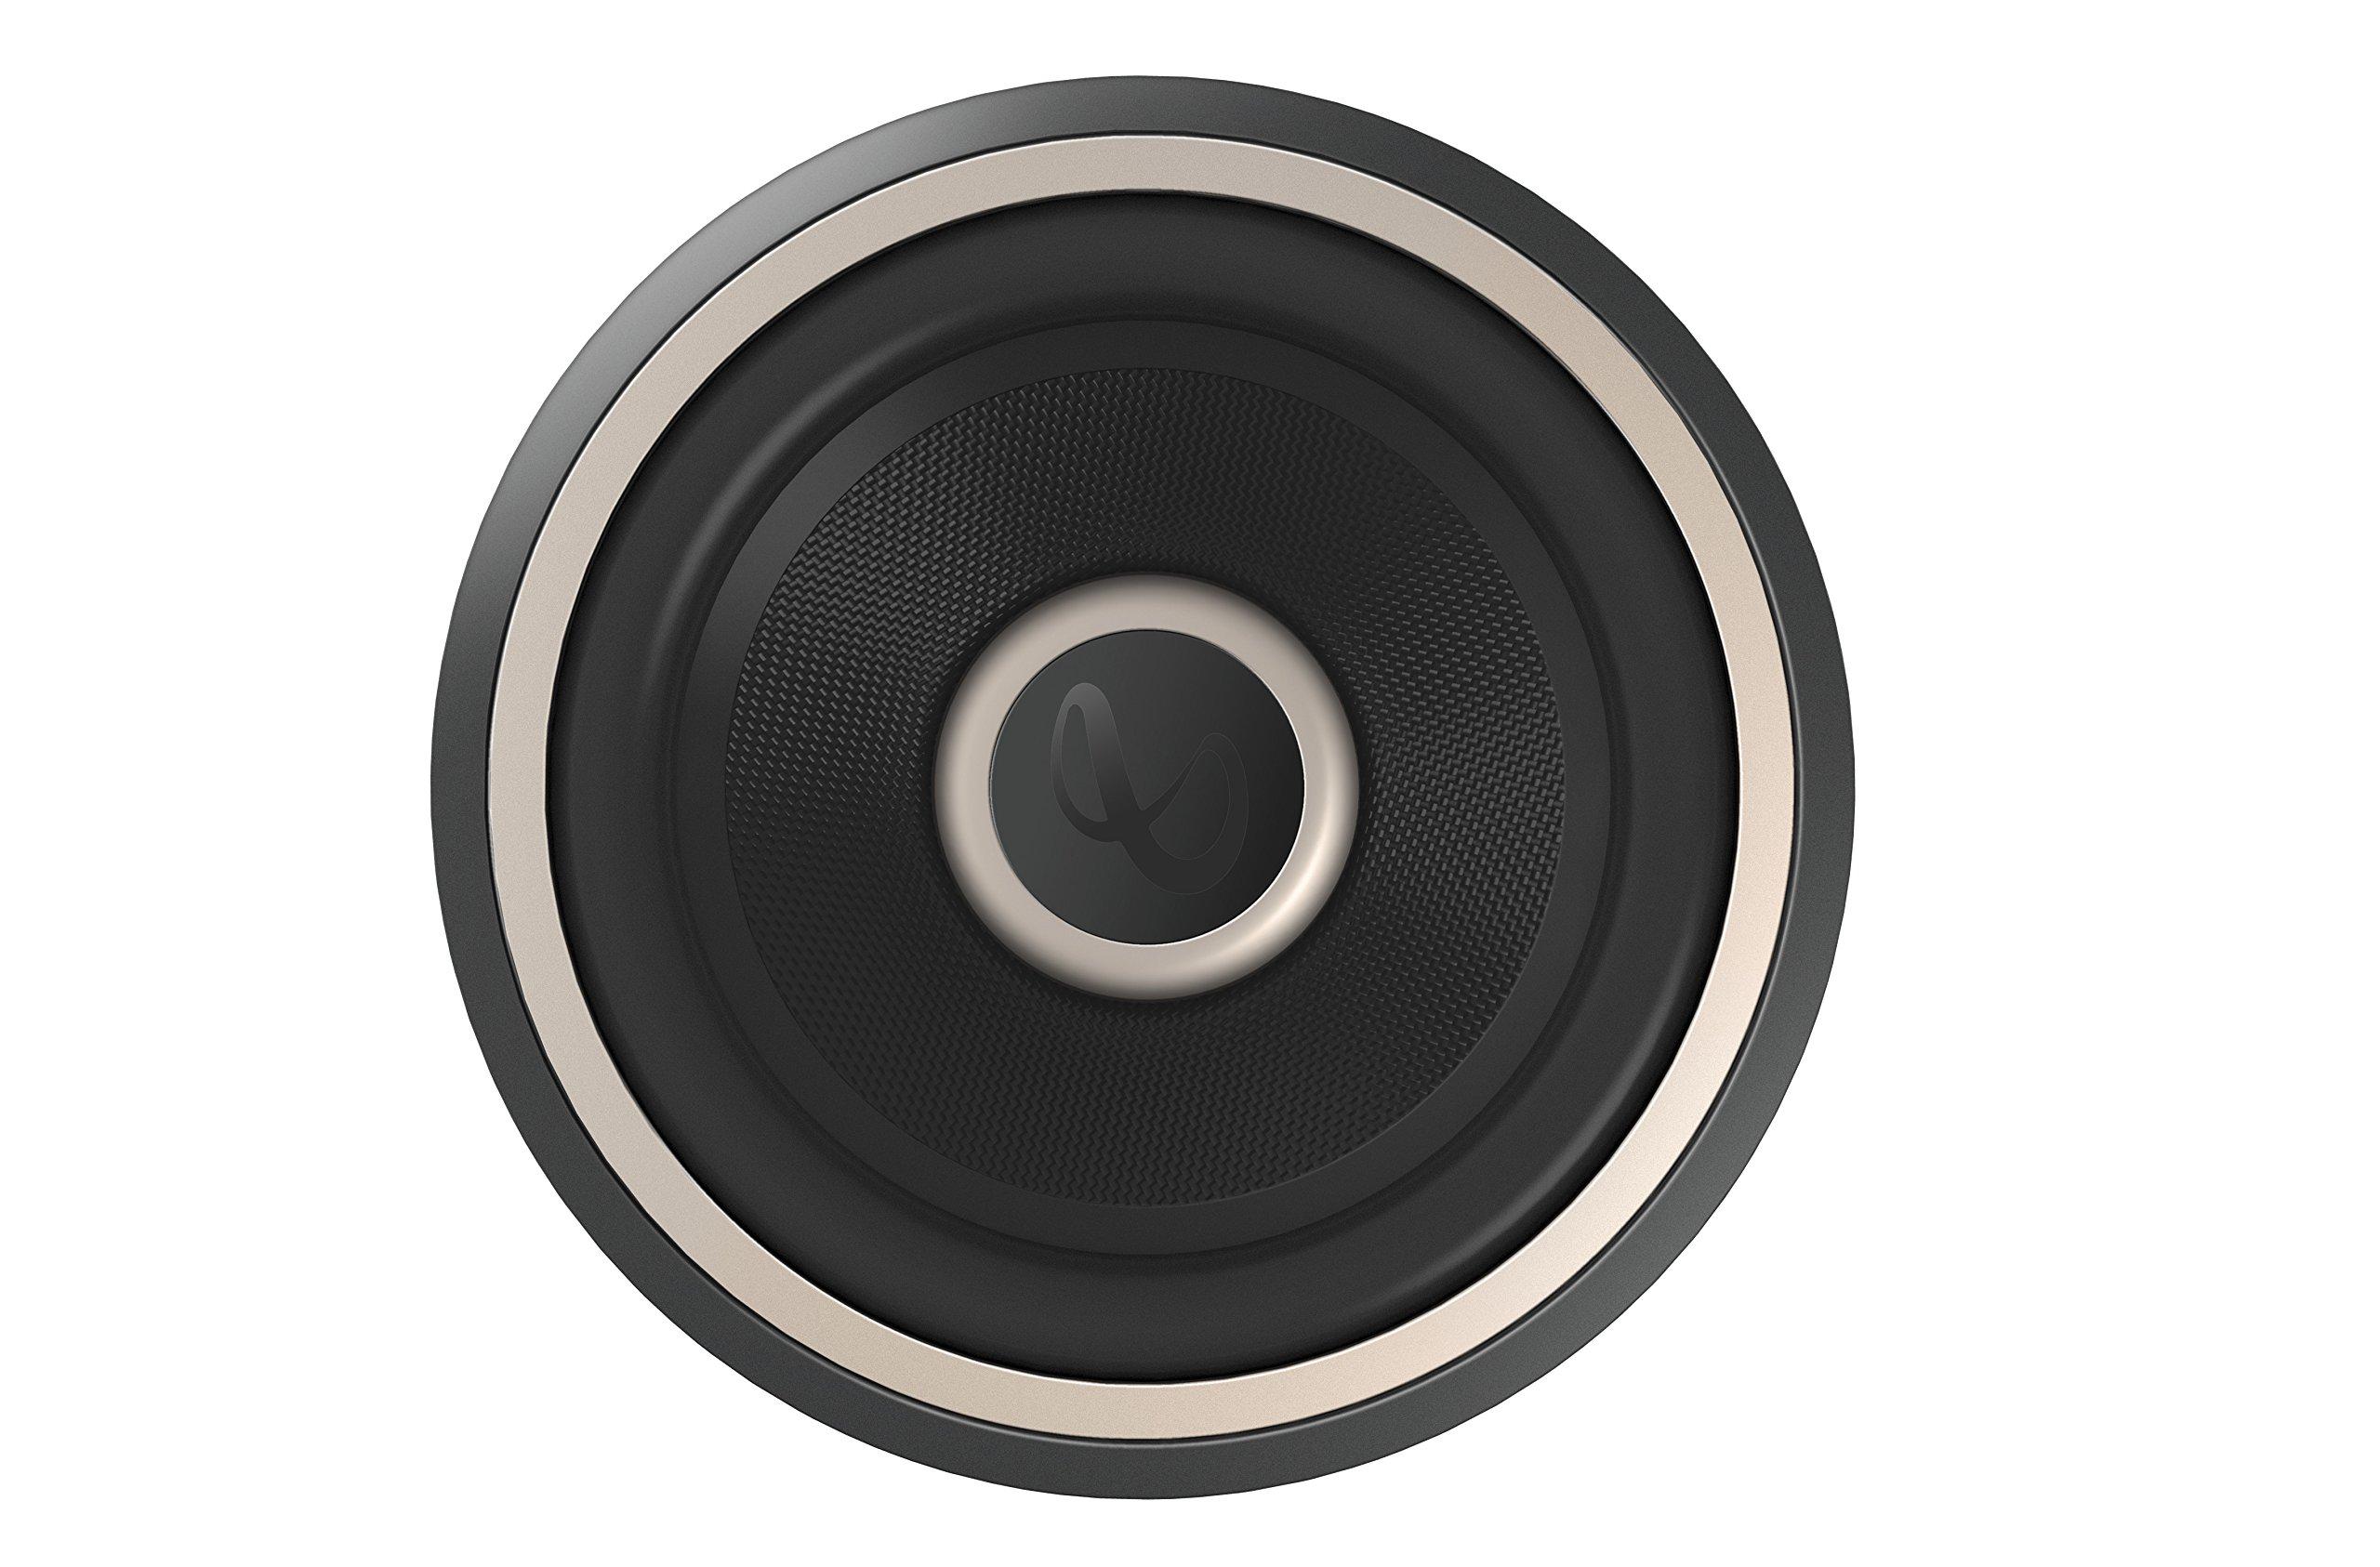 Infinity Kappa 1000W Audio Subwoofer